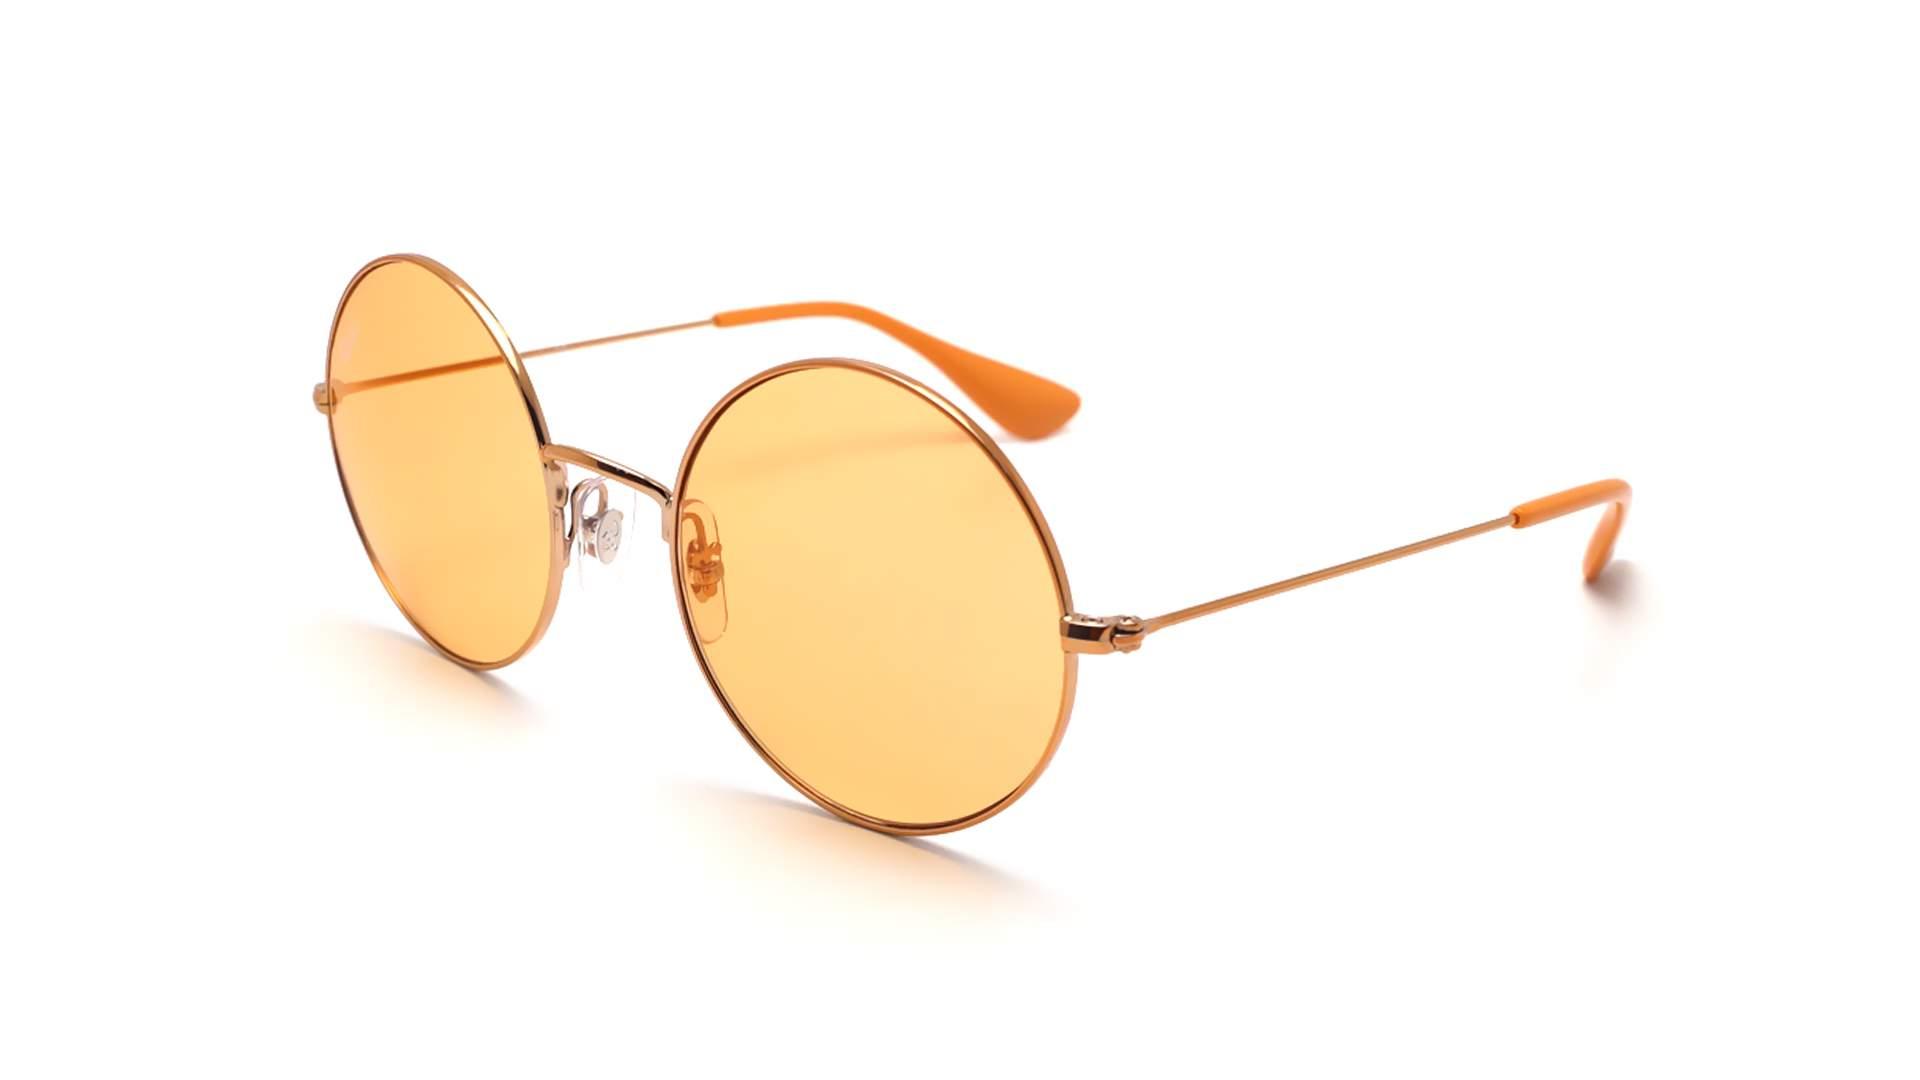 7c167ae2991f Sunglasses Ray-Ban Ja-jo Copper RB3592 9035 C6 50-20 Medium Mirror